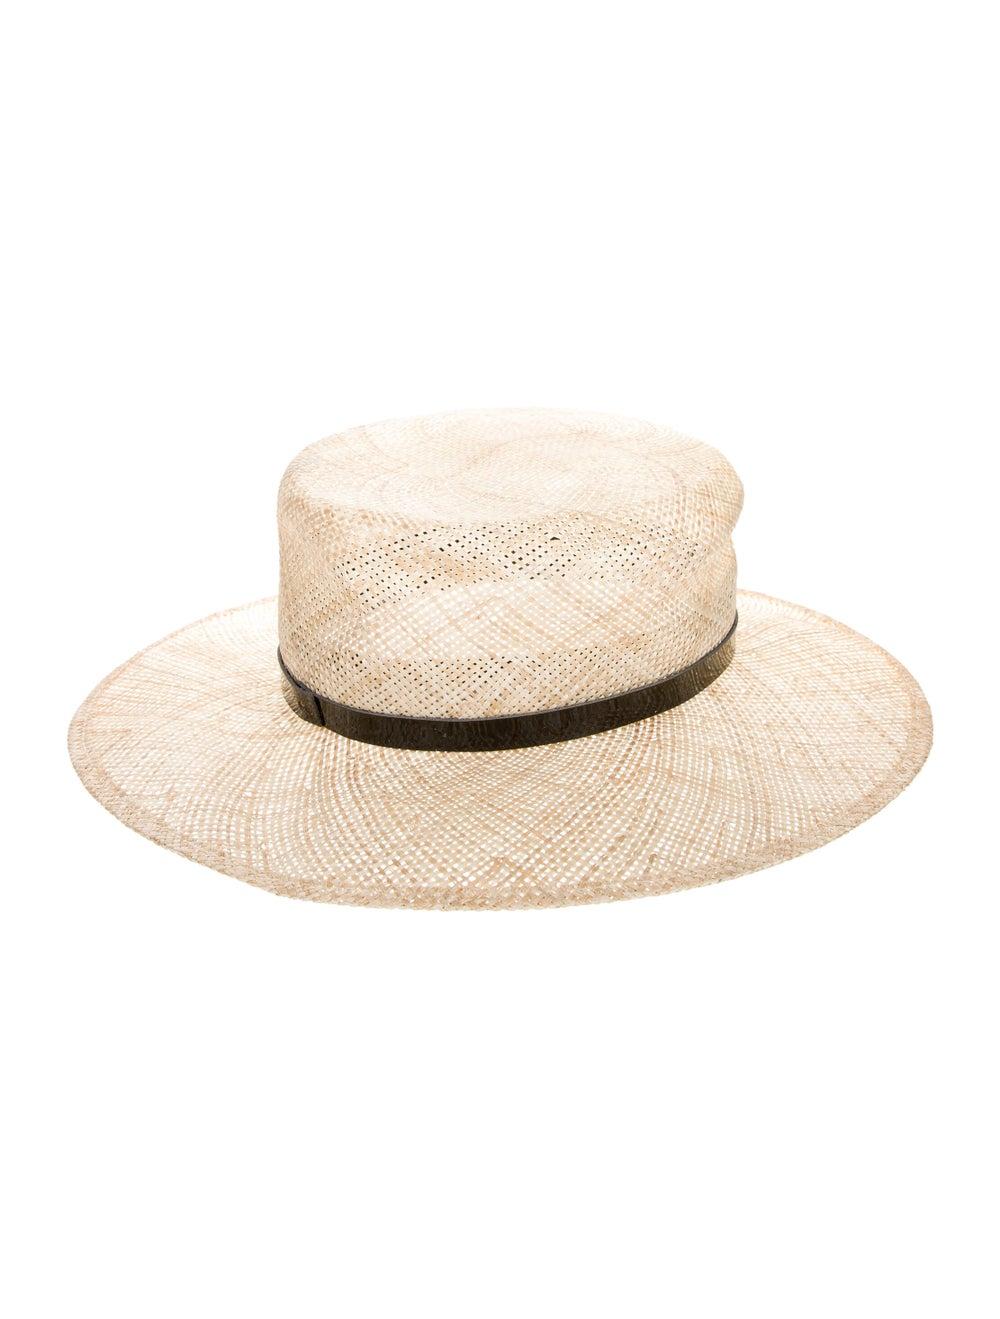 Janessa Leone Straw Hat black - image 2